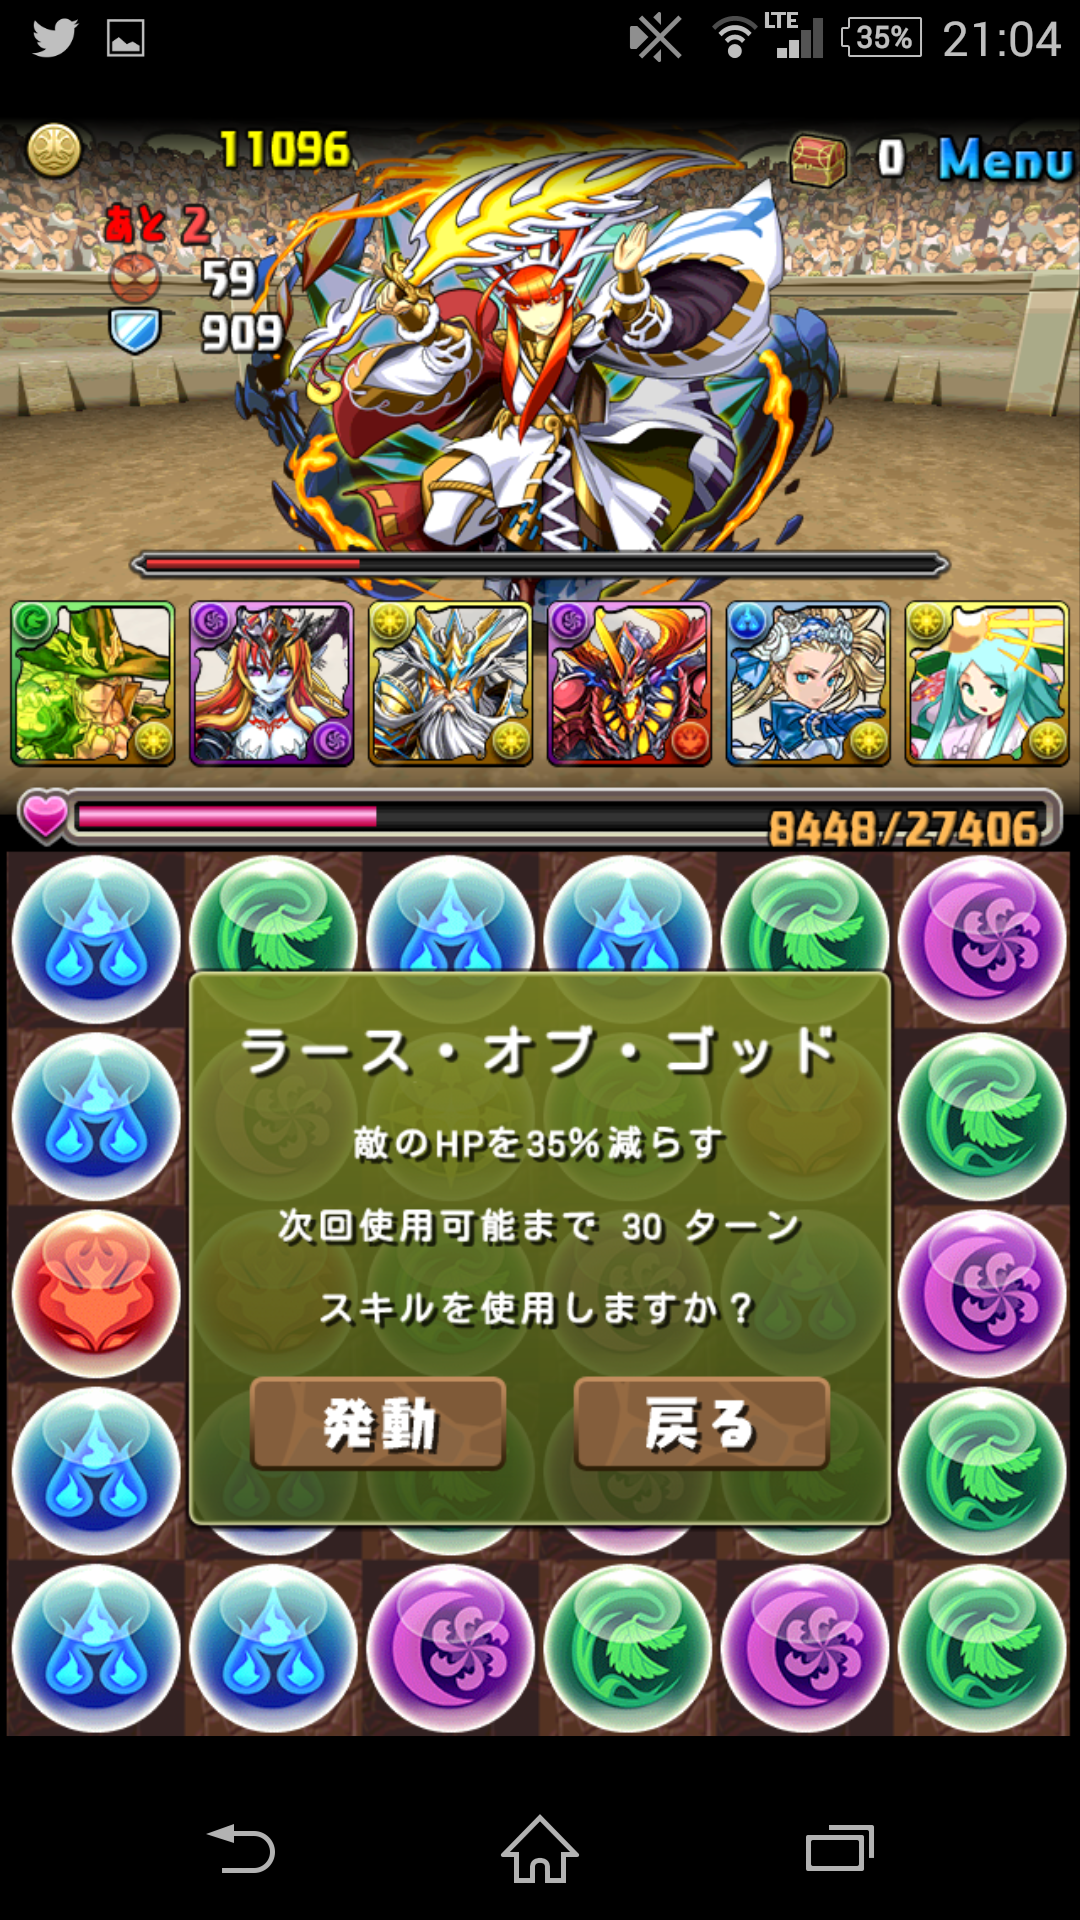 Screenshot_2015-01-29-21-04-56.png